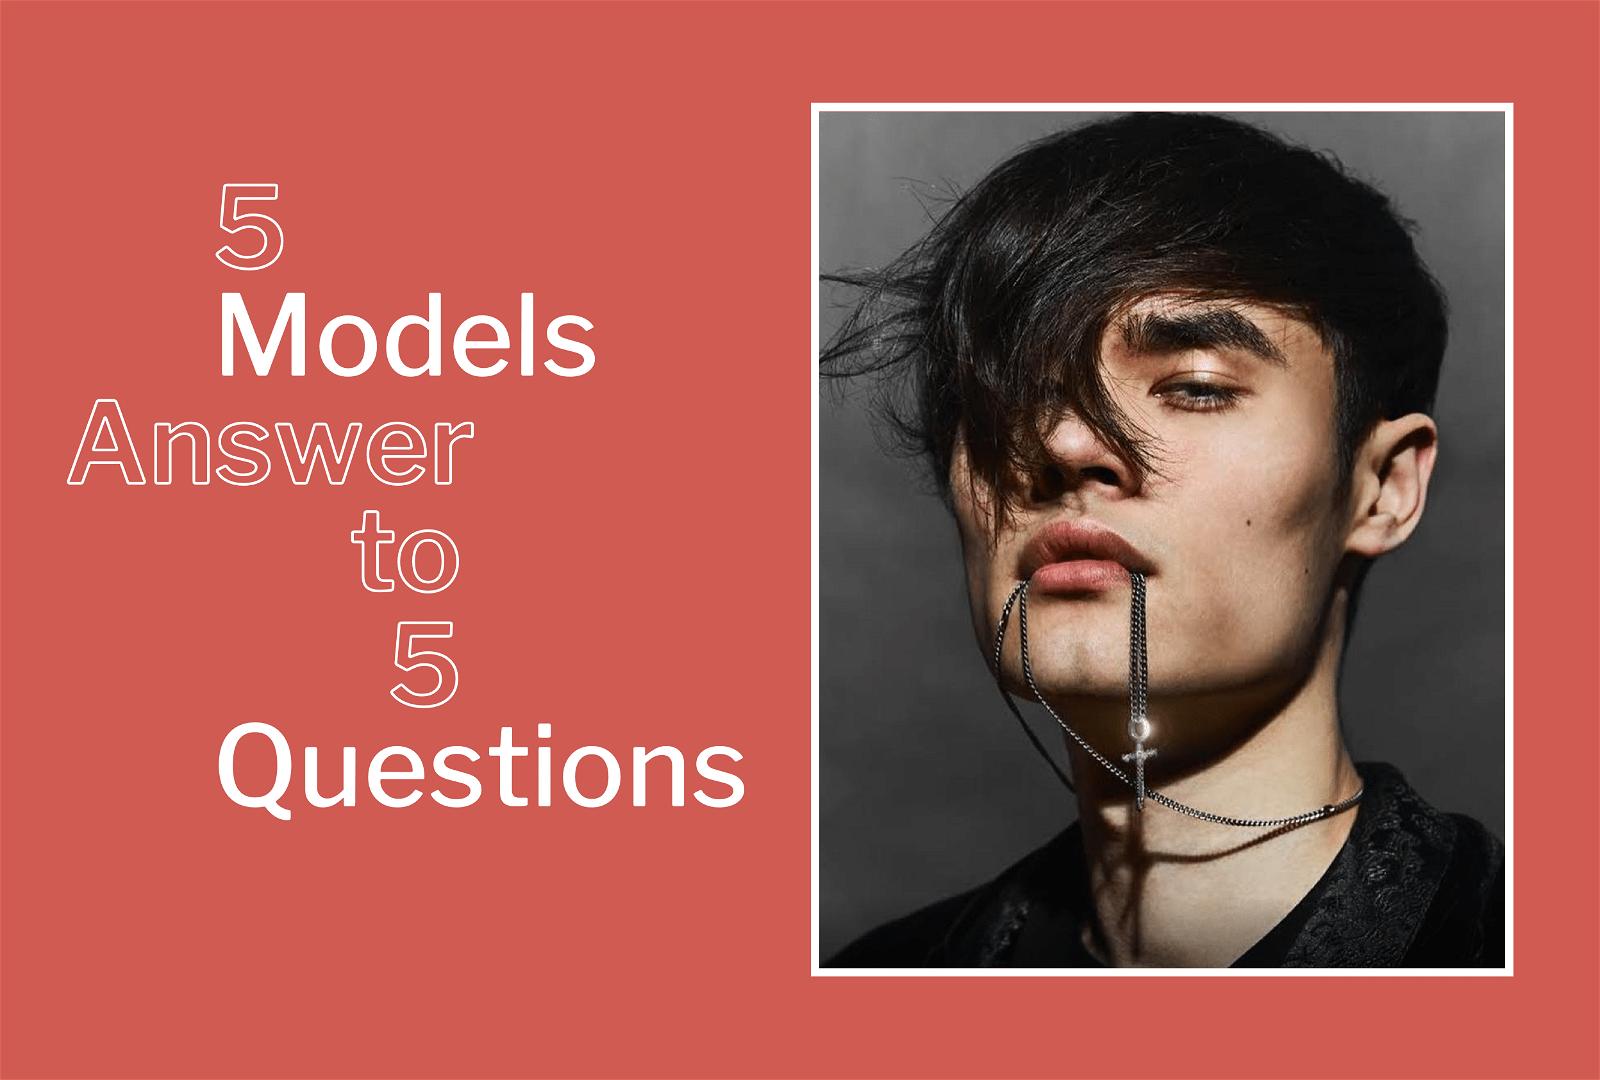 Models - Tristan Lim